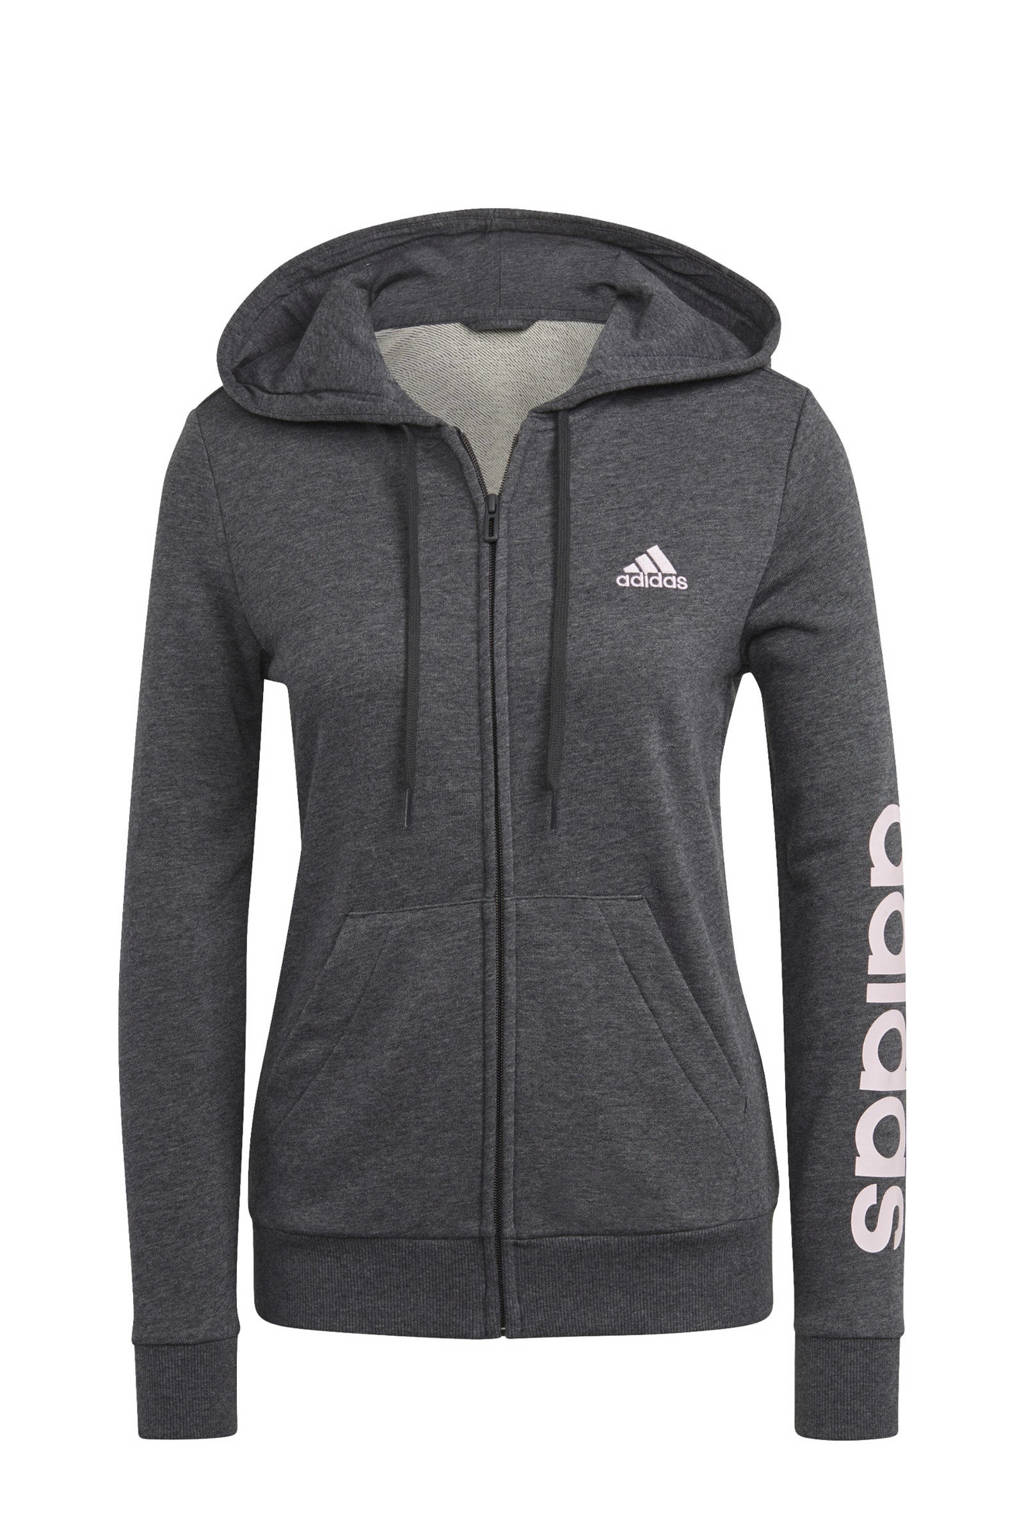 adidas Performance sportvest grijs/lichtroze, Grijs/lichtroze